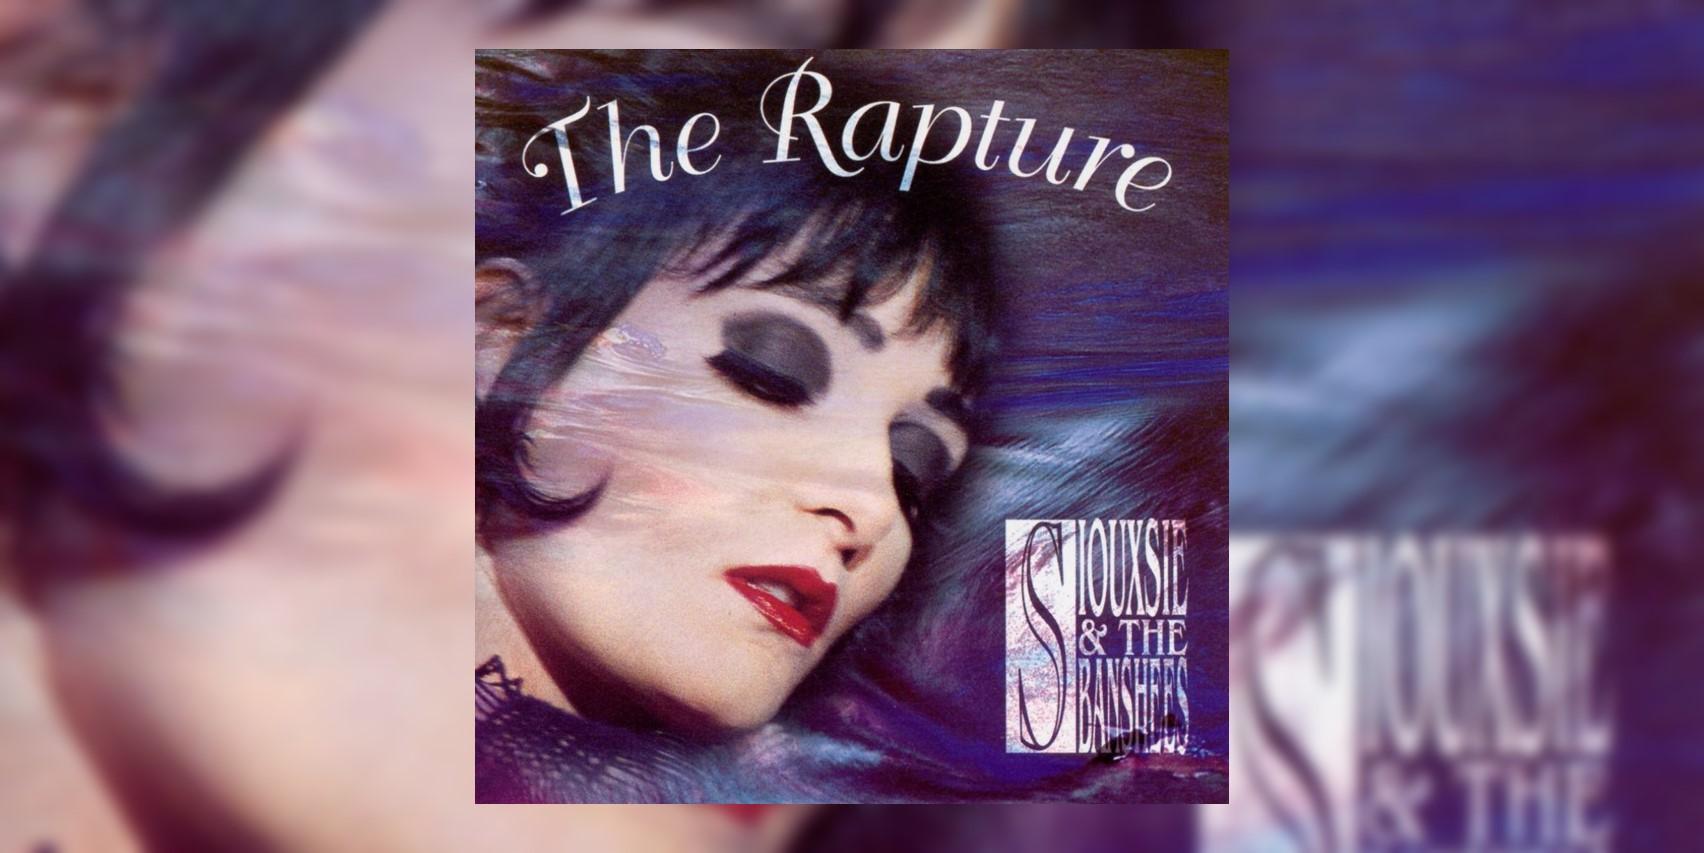 SiouxsieAndTheBanshees_TheRapture_MainImage.jpg